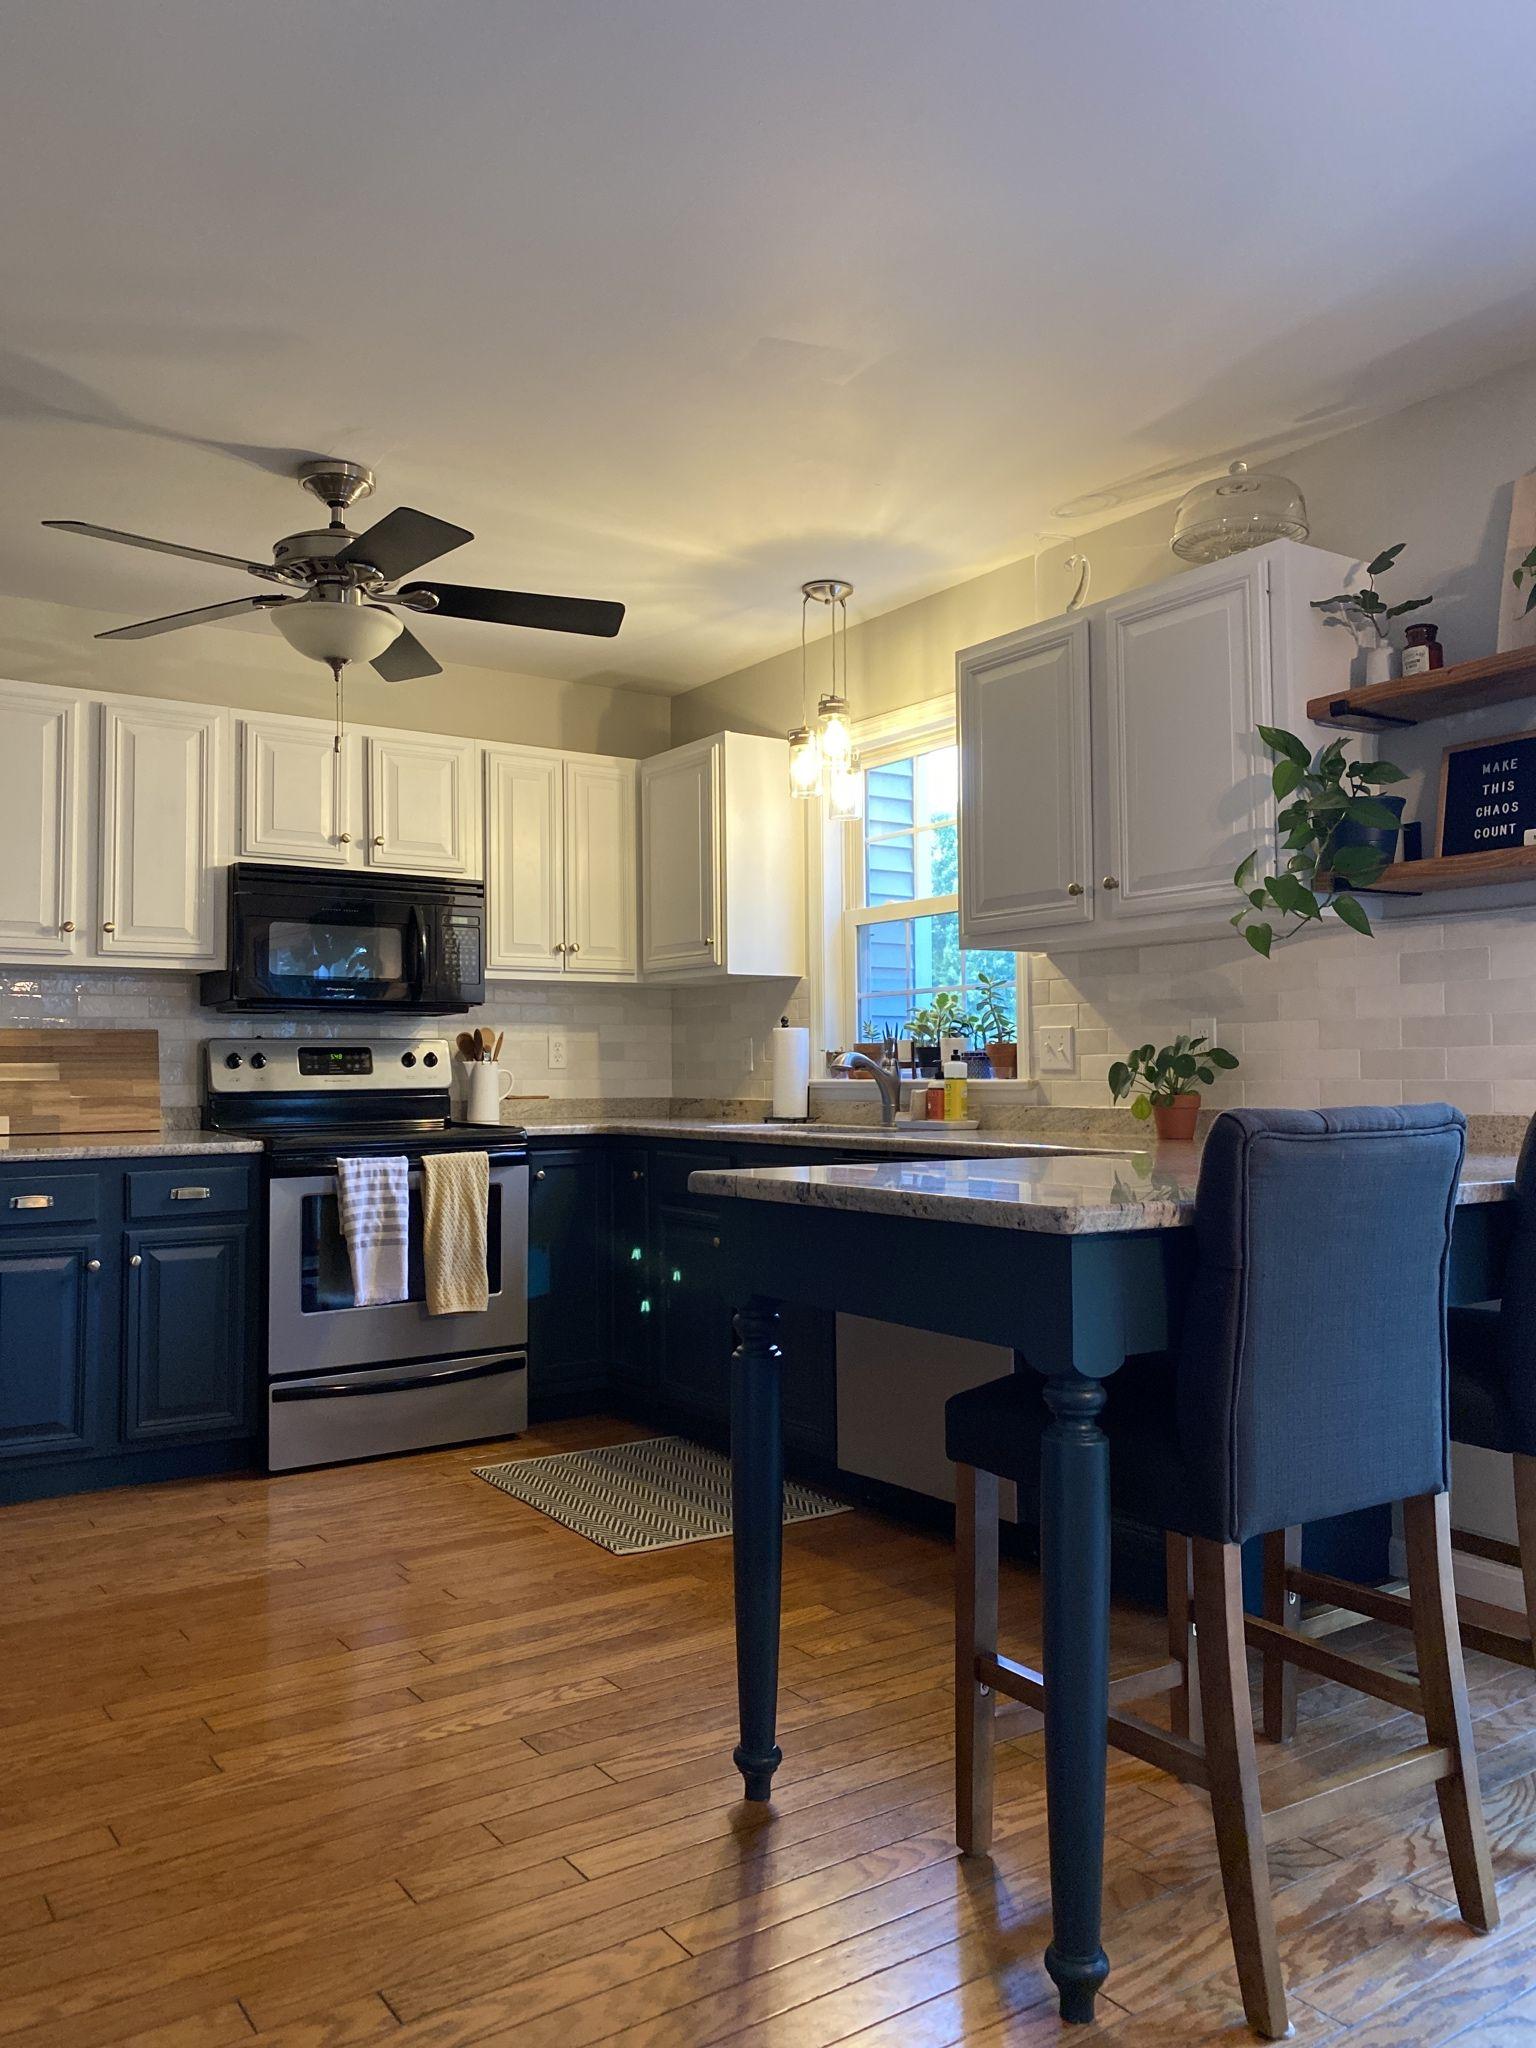 Diy Kitchen Remodel In 2020 Diy Kitchen Remodel Kitchen Remodel Diy Kitchen